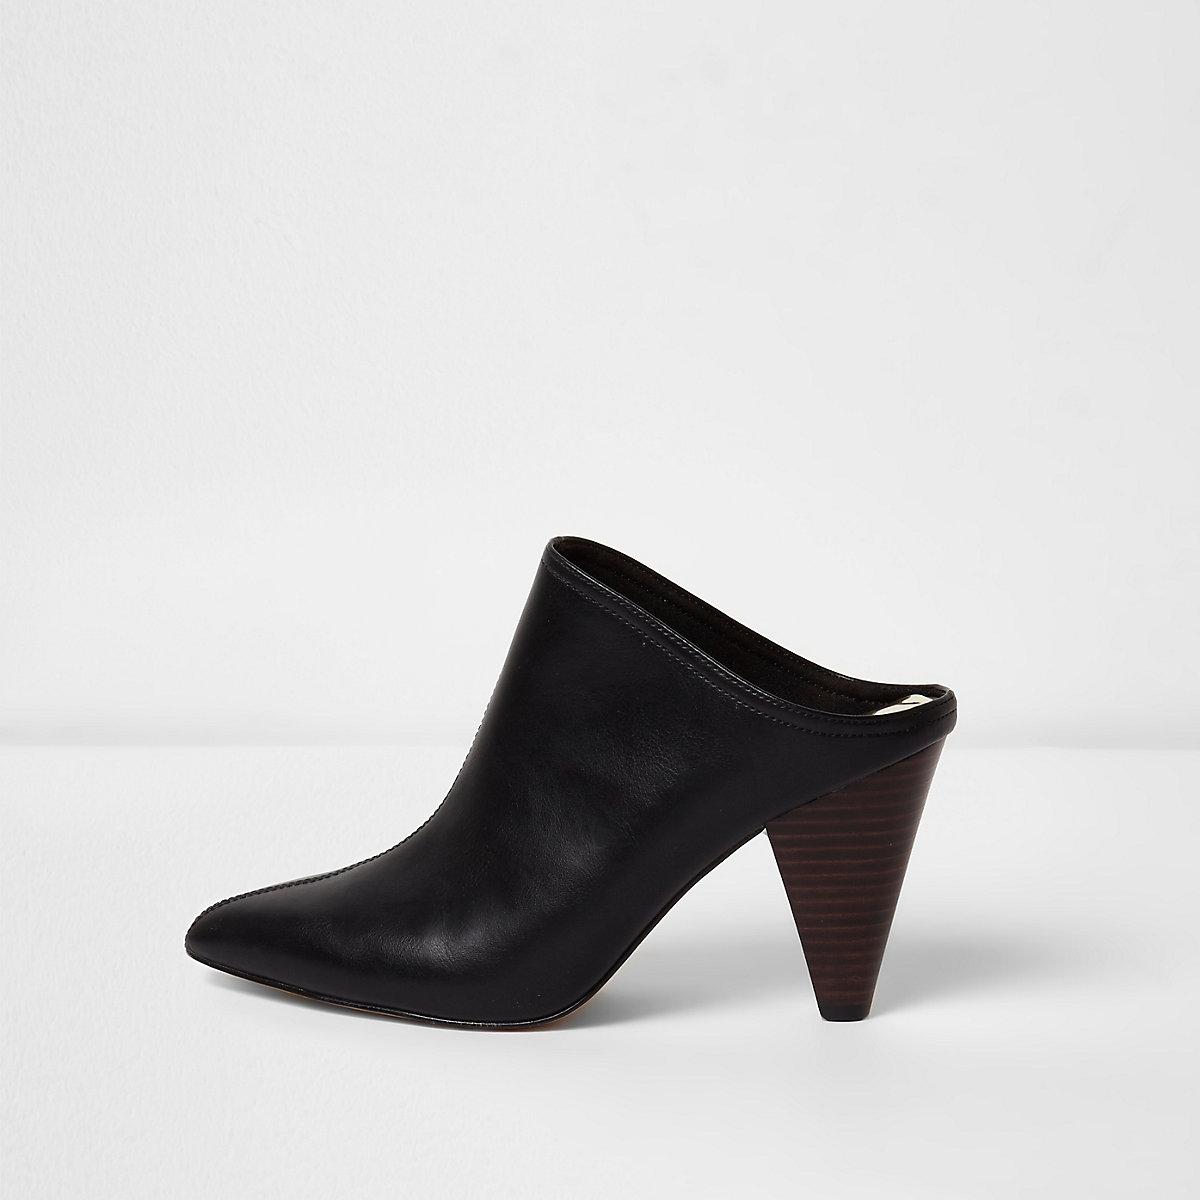 Black pointed toe cone heel mules